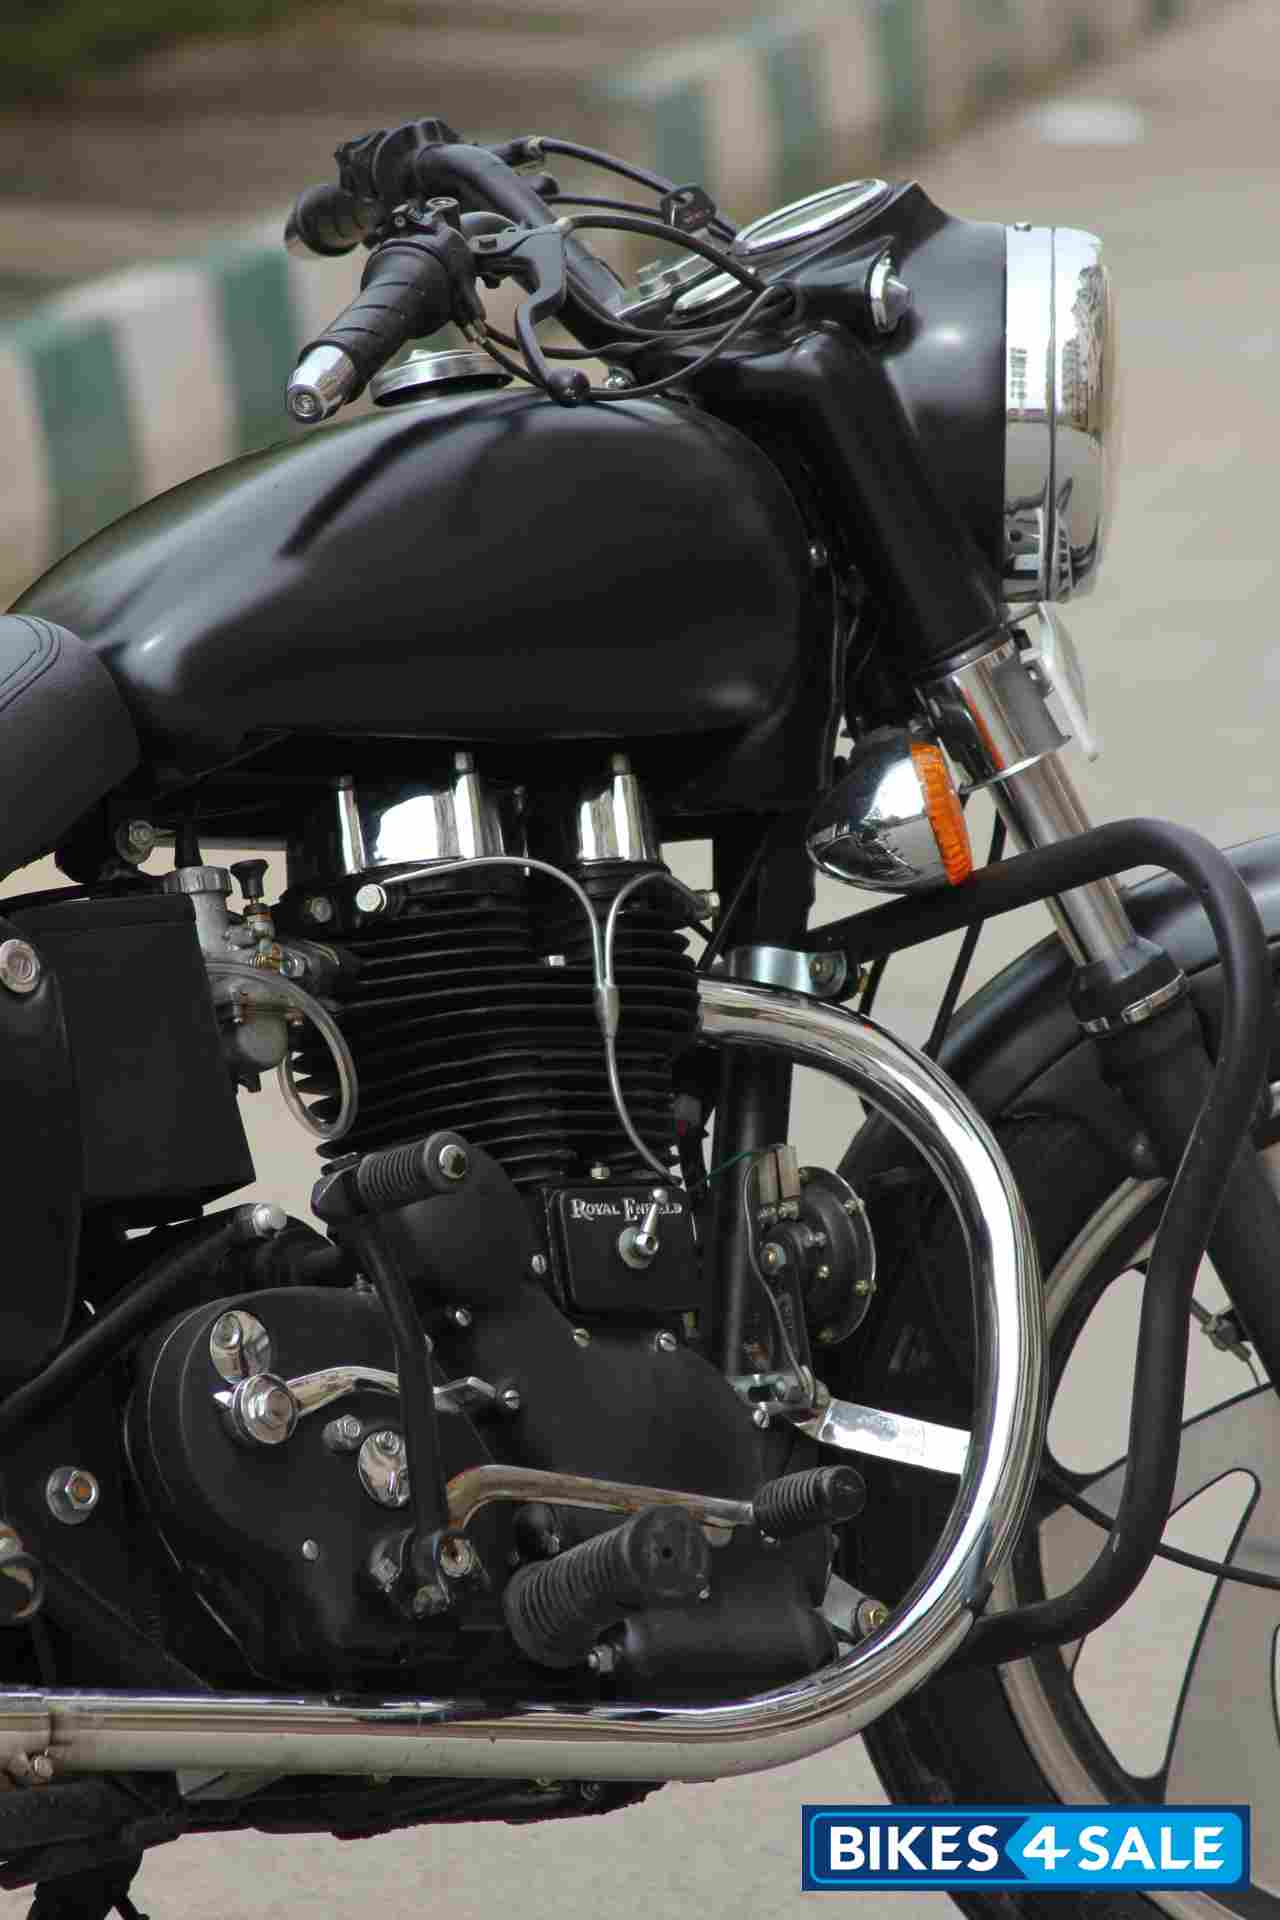 Used 1983 Model Royal Enfield Bullet Standard 350 For Sale In Trivandrum Id 79532 Matte Black Colour Bikes4sale